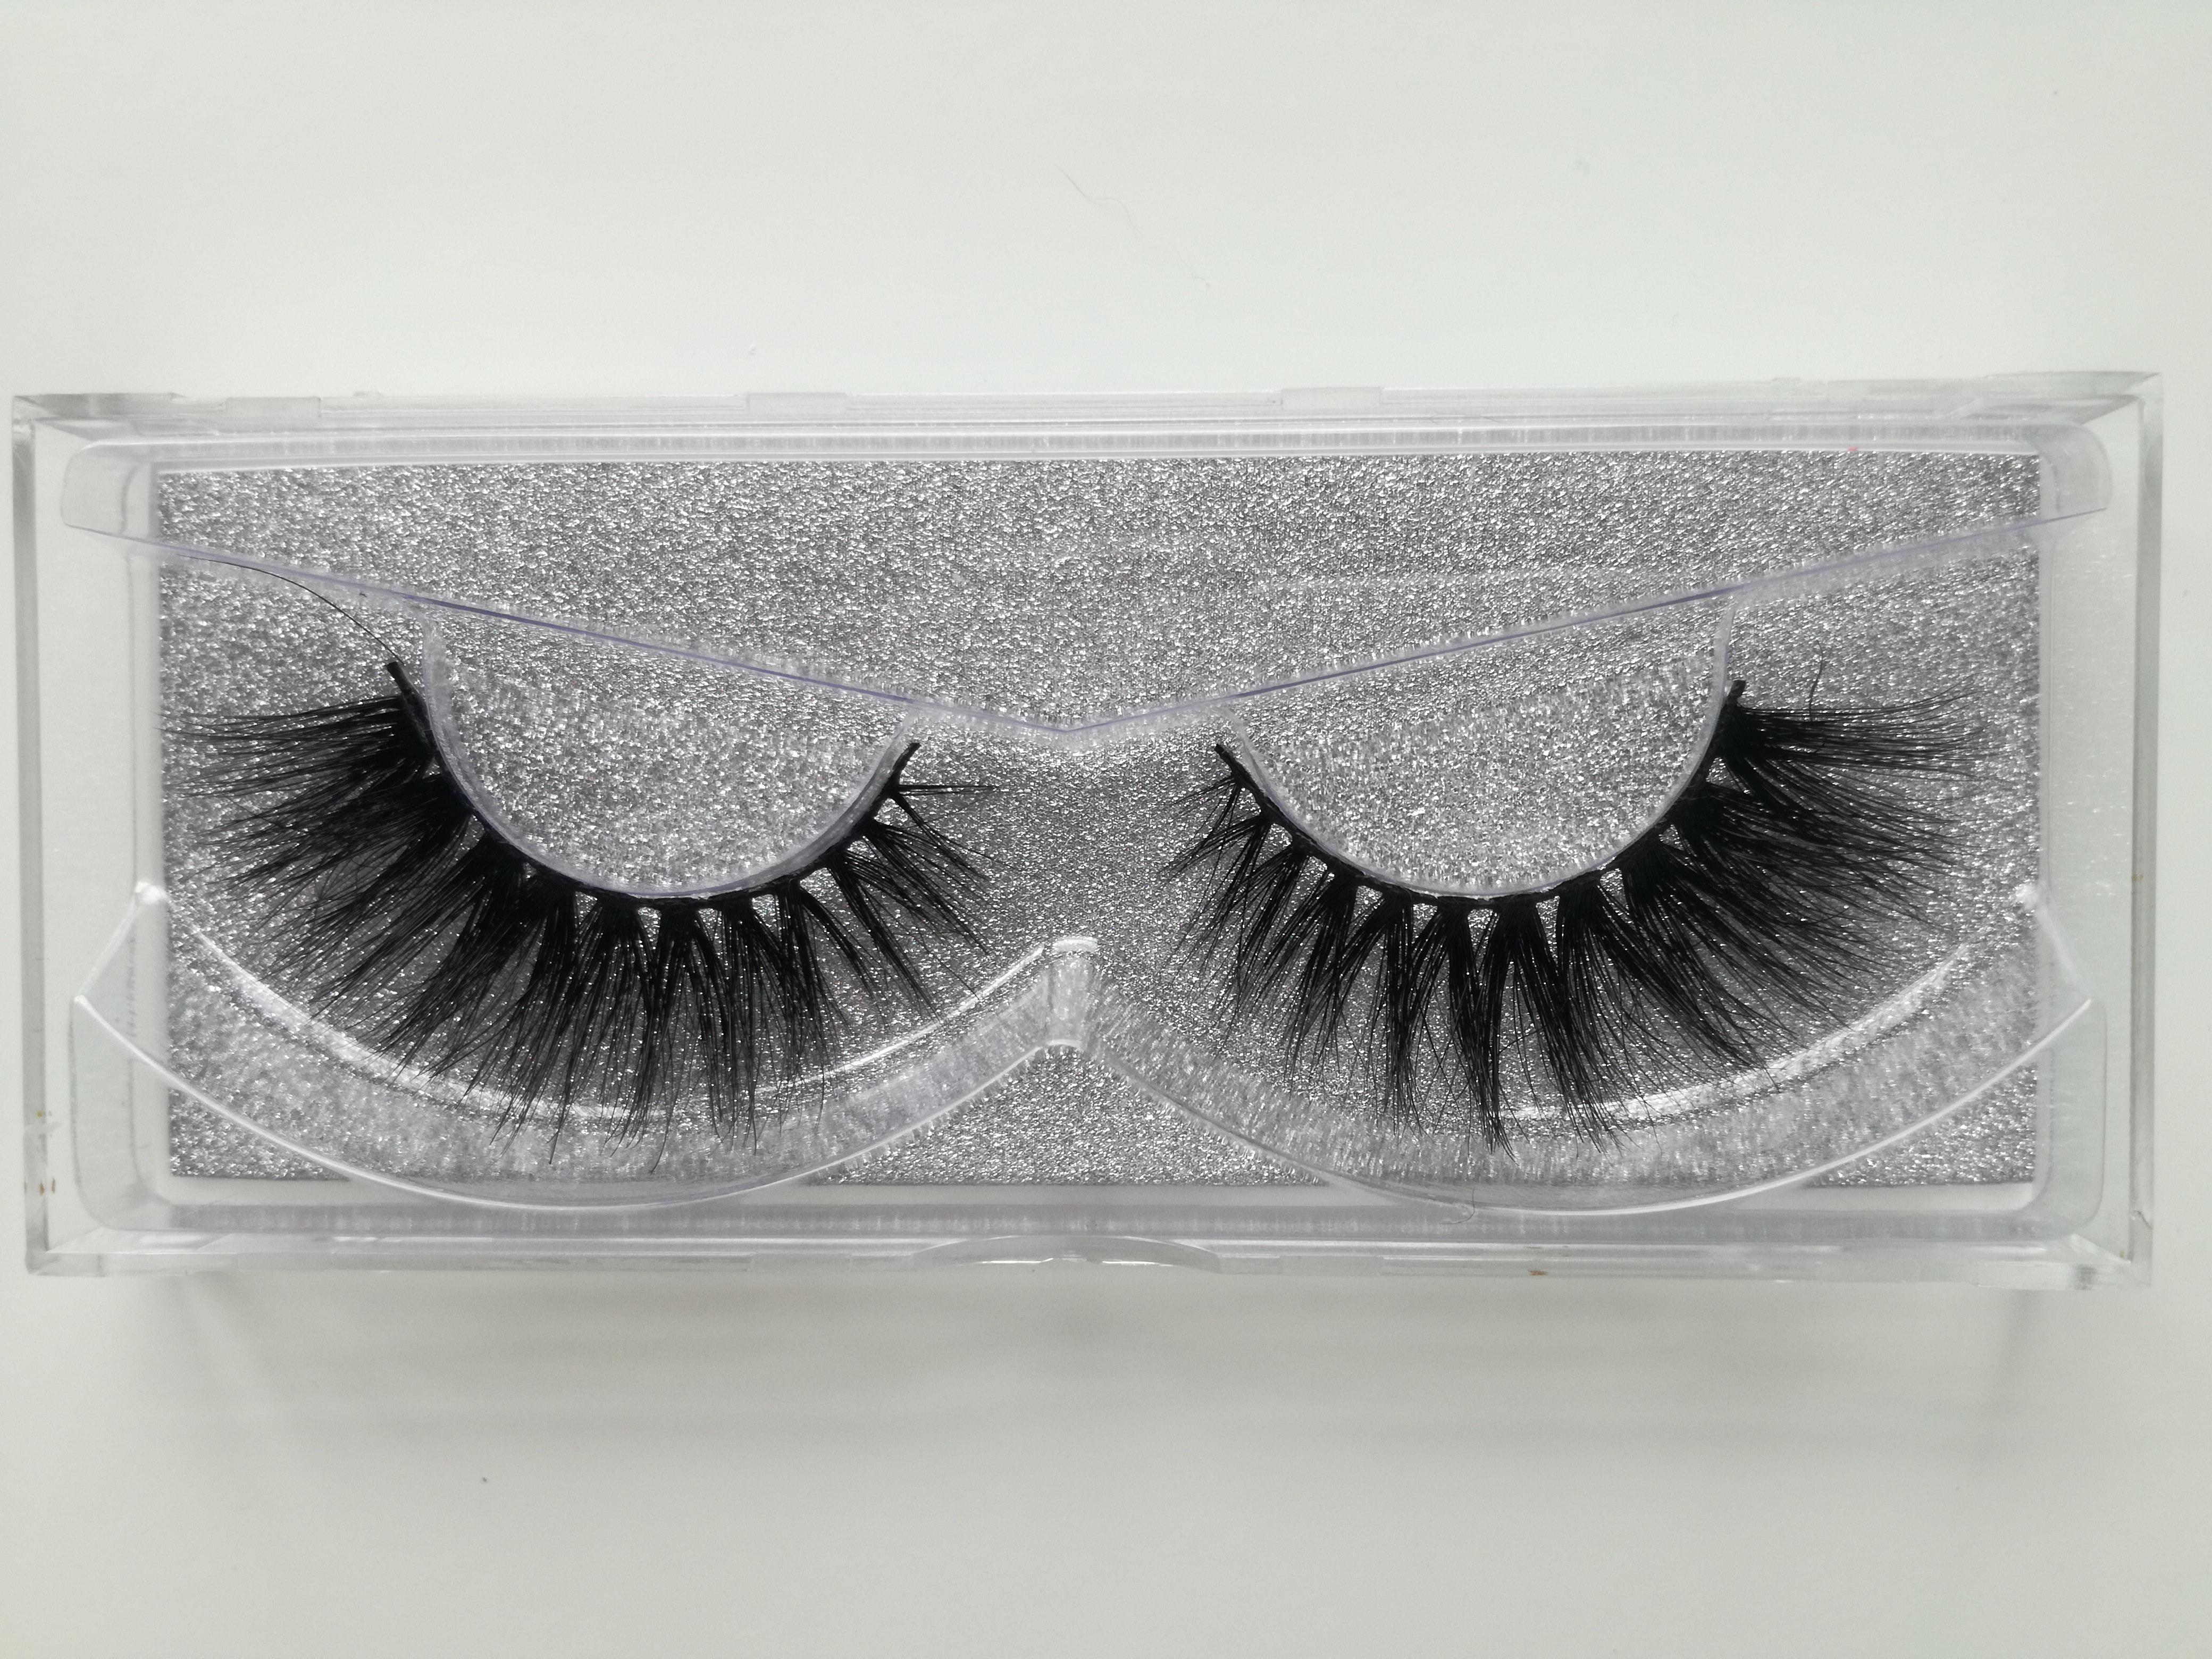 File:Khloe 3d mink lashes.jpg - Wikimedia Commons